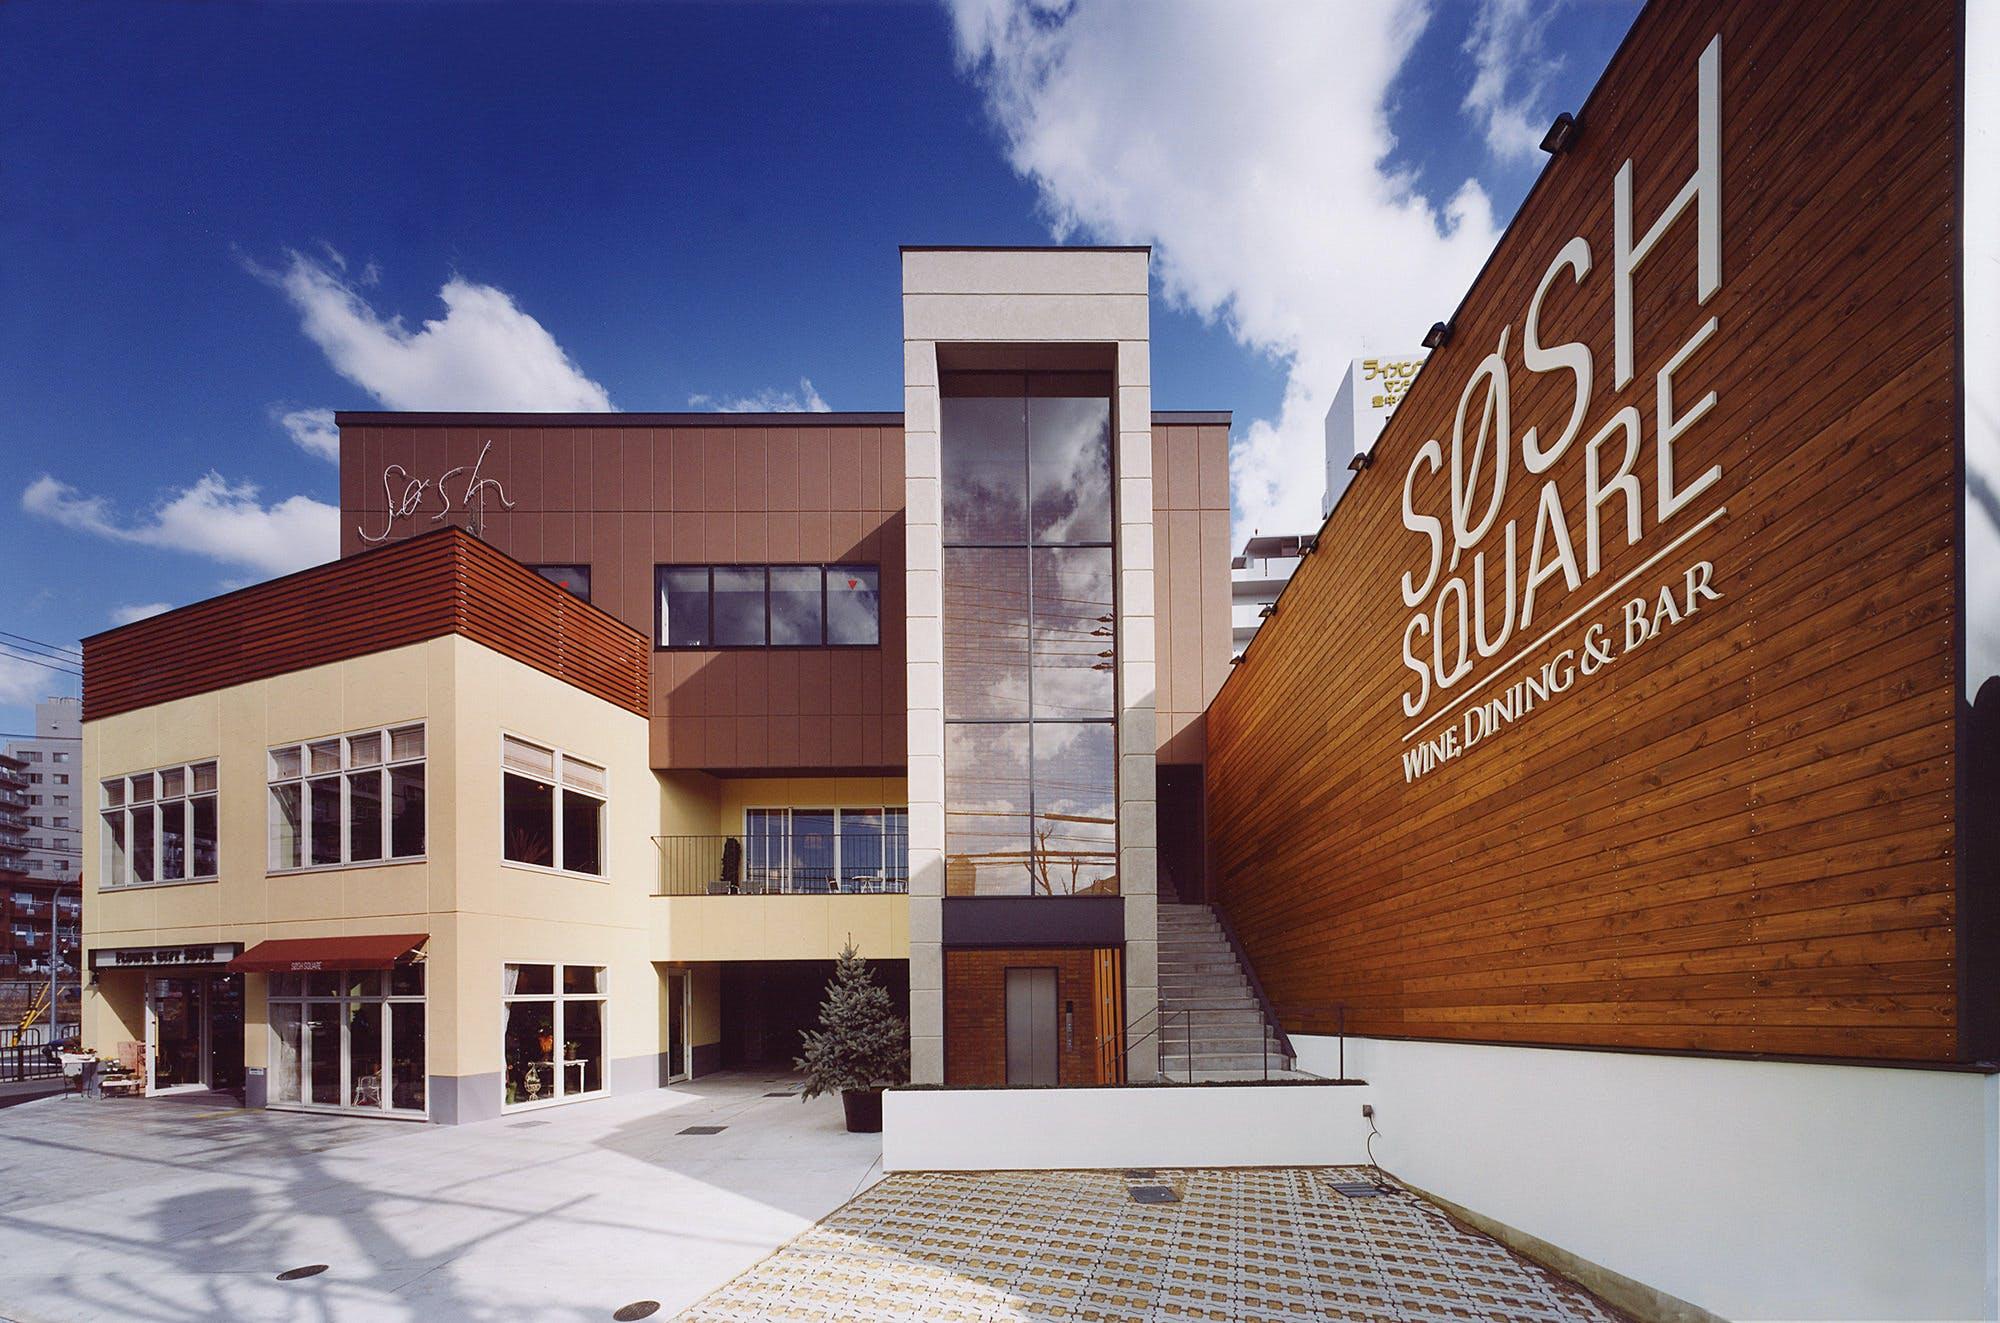 SOSH SQUARE